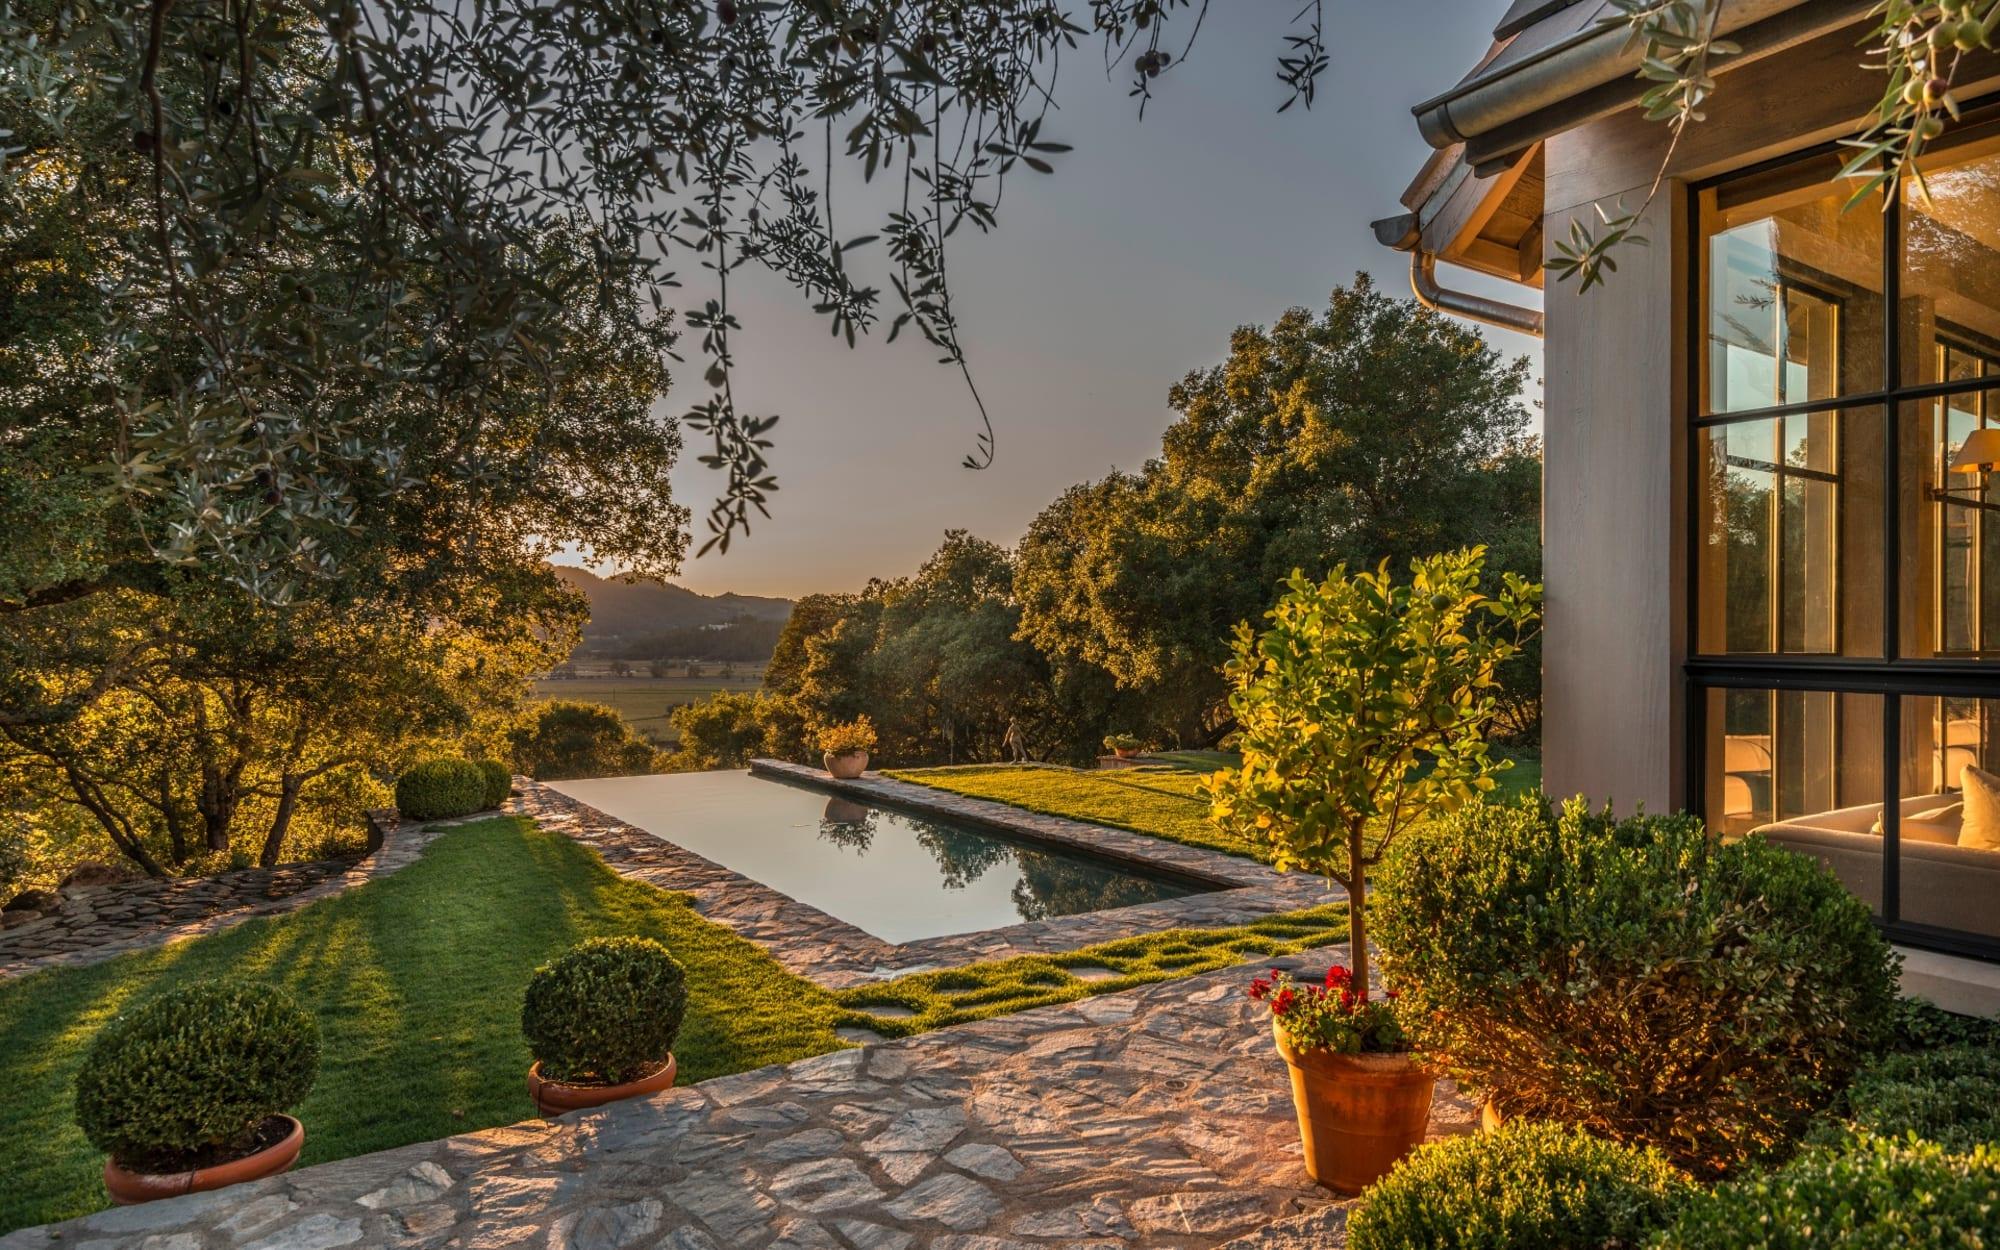 Luxury Homes For Sale In Napa California | Sonoma County Real Estate